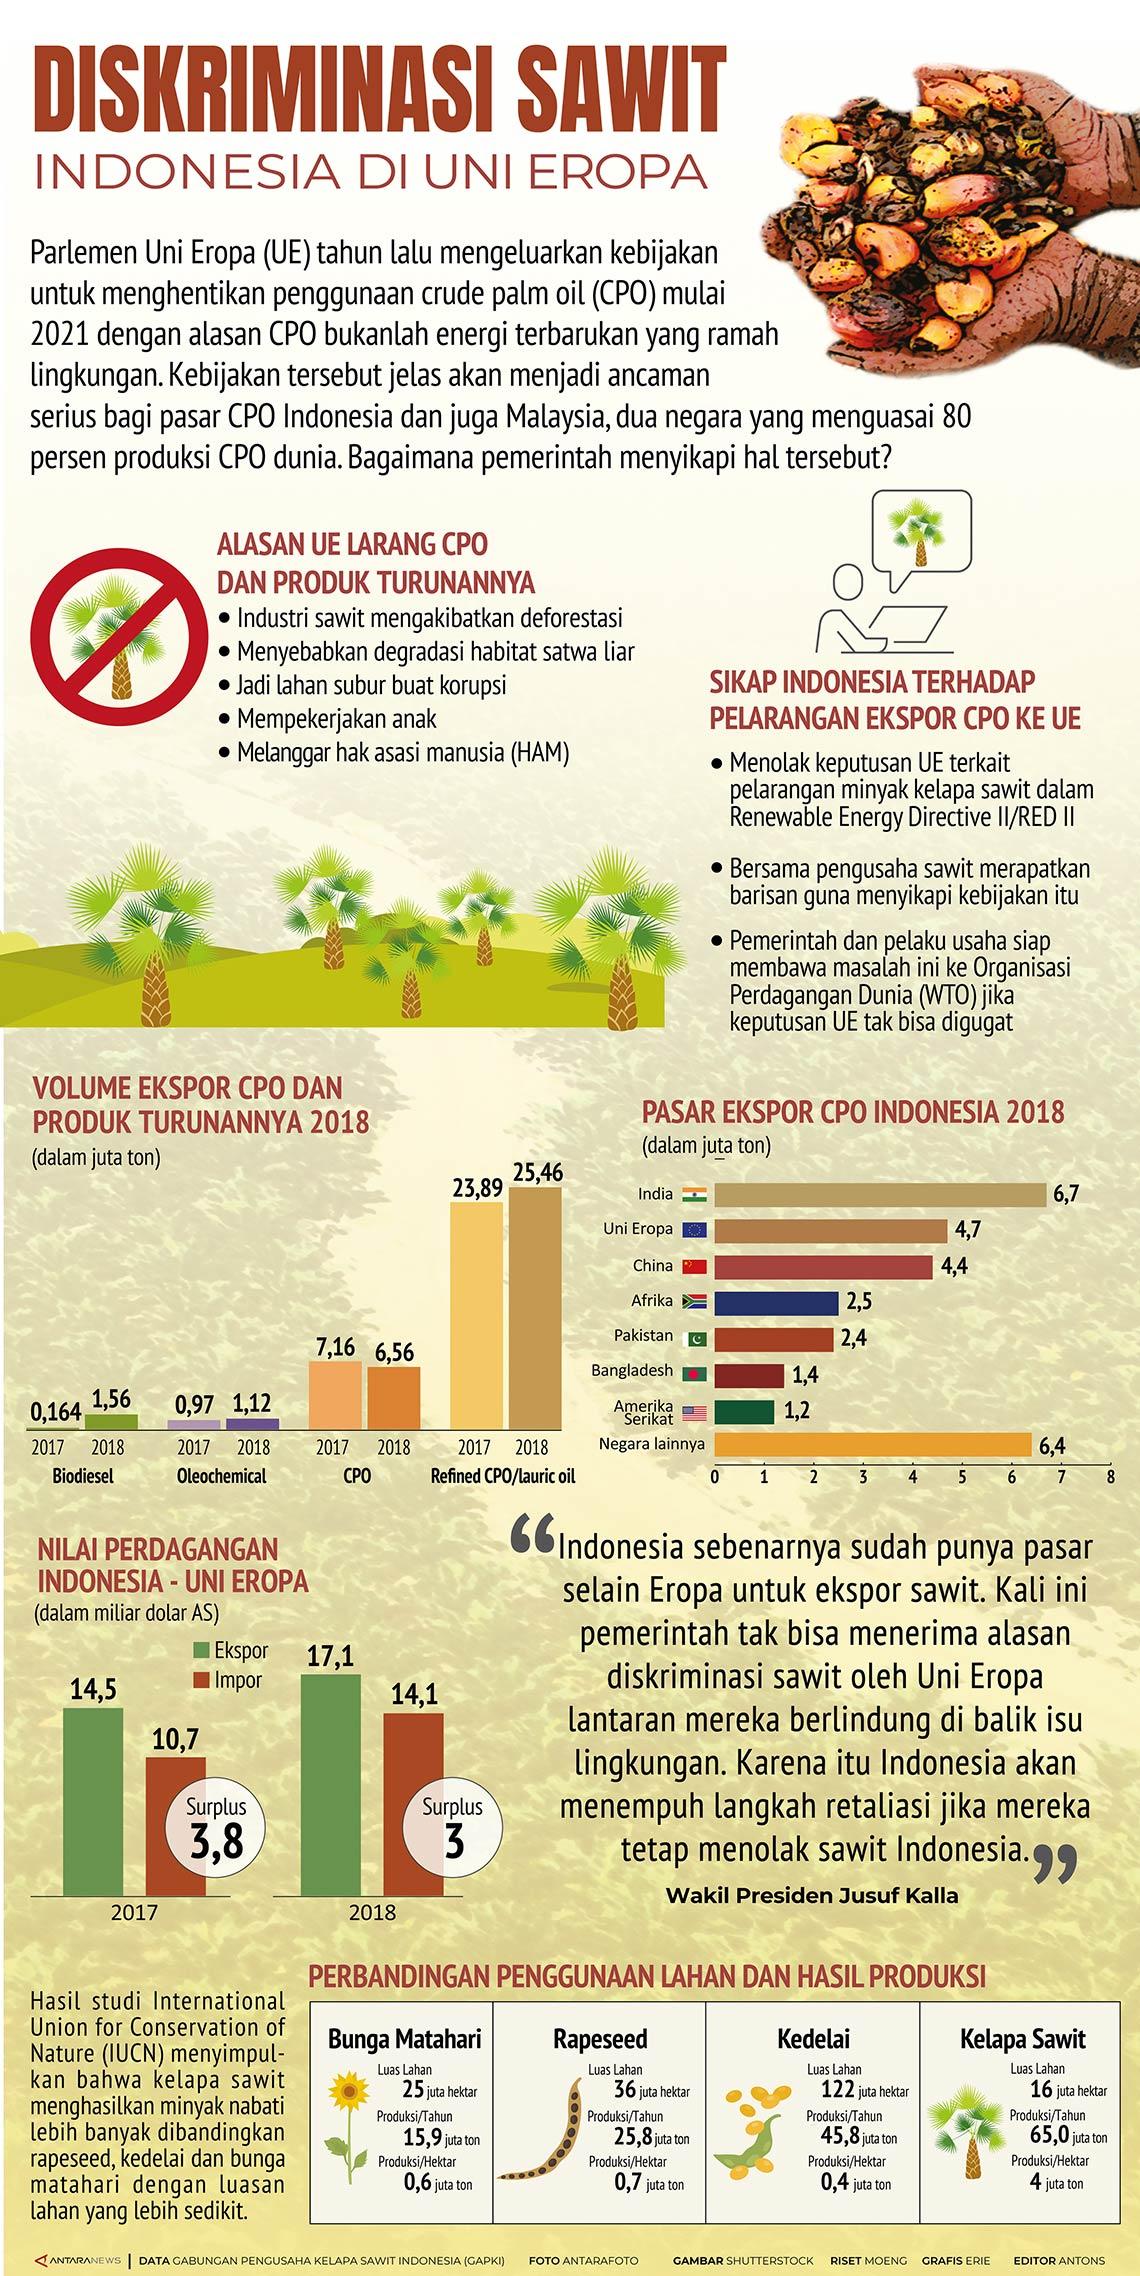 Diskriminasi Sawit Indonesia di Uni-Eropa